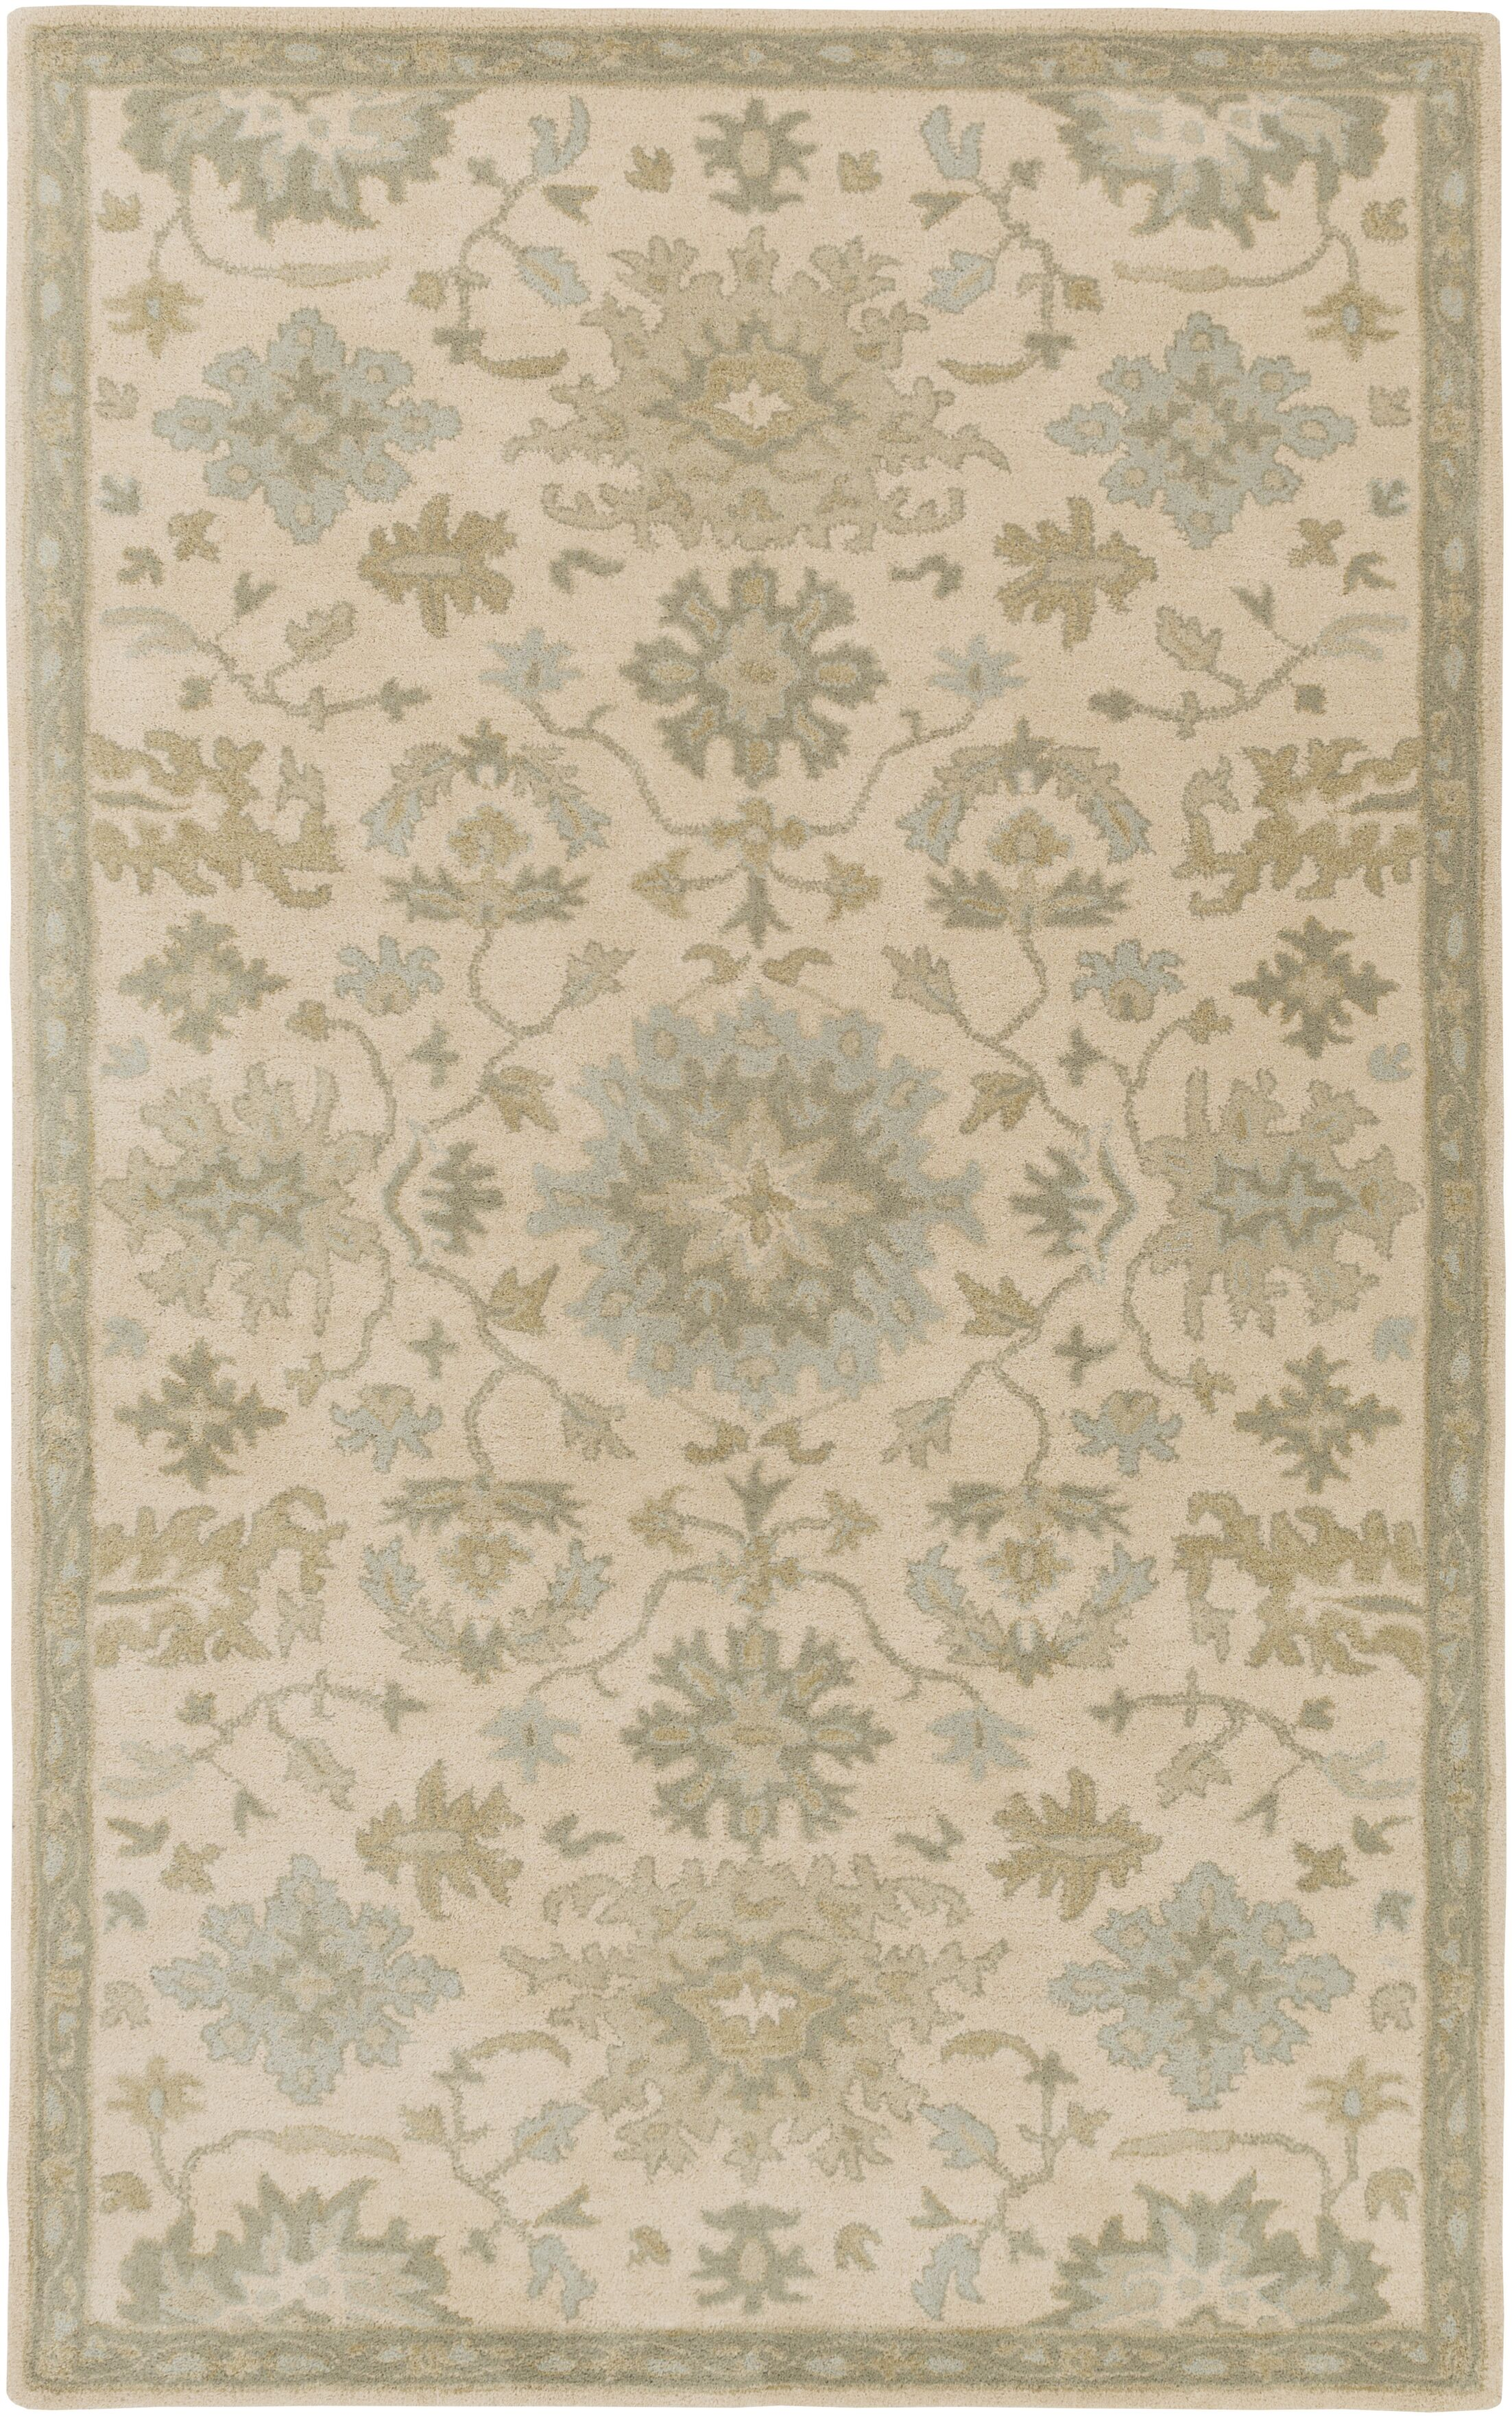 Willard Hand-Woven Wool Beige/Green Area Rug Rug Size: Rectangle 7'6